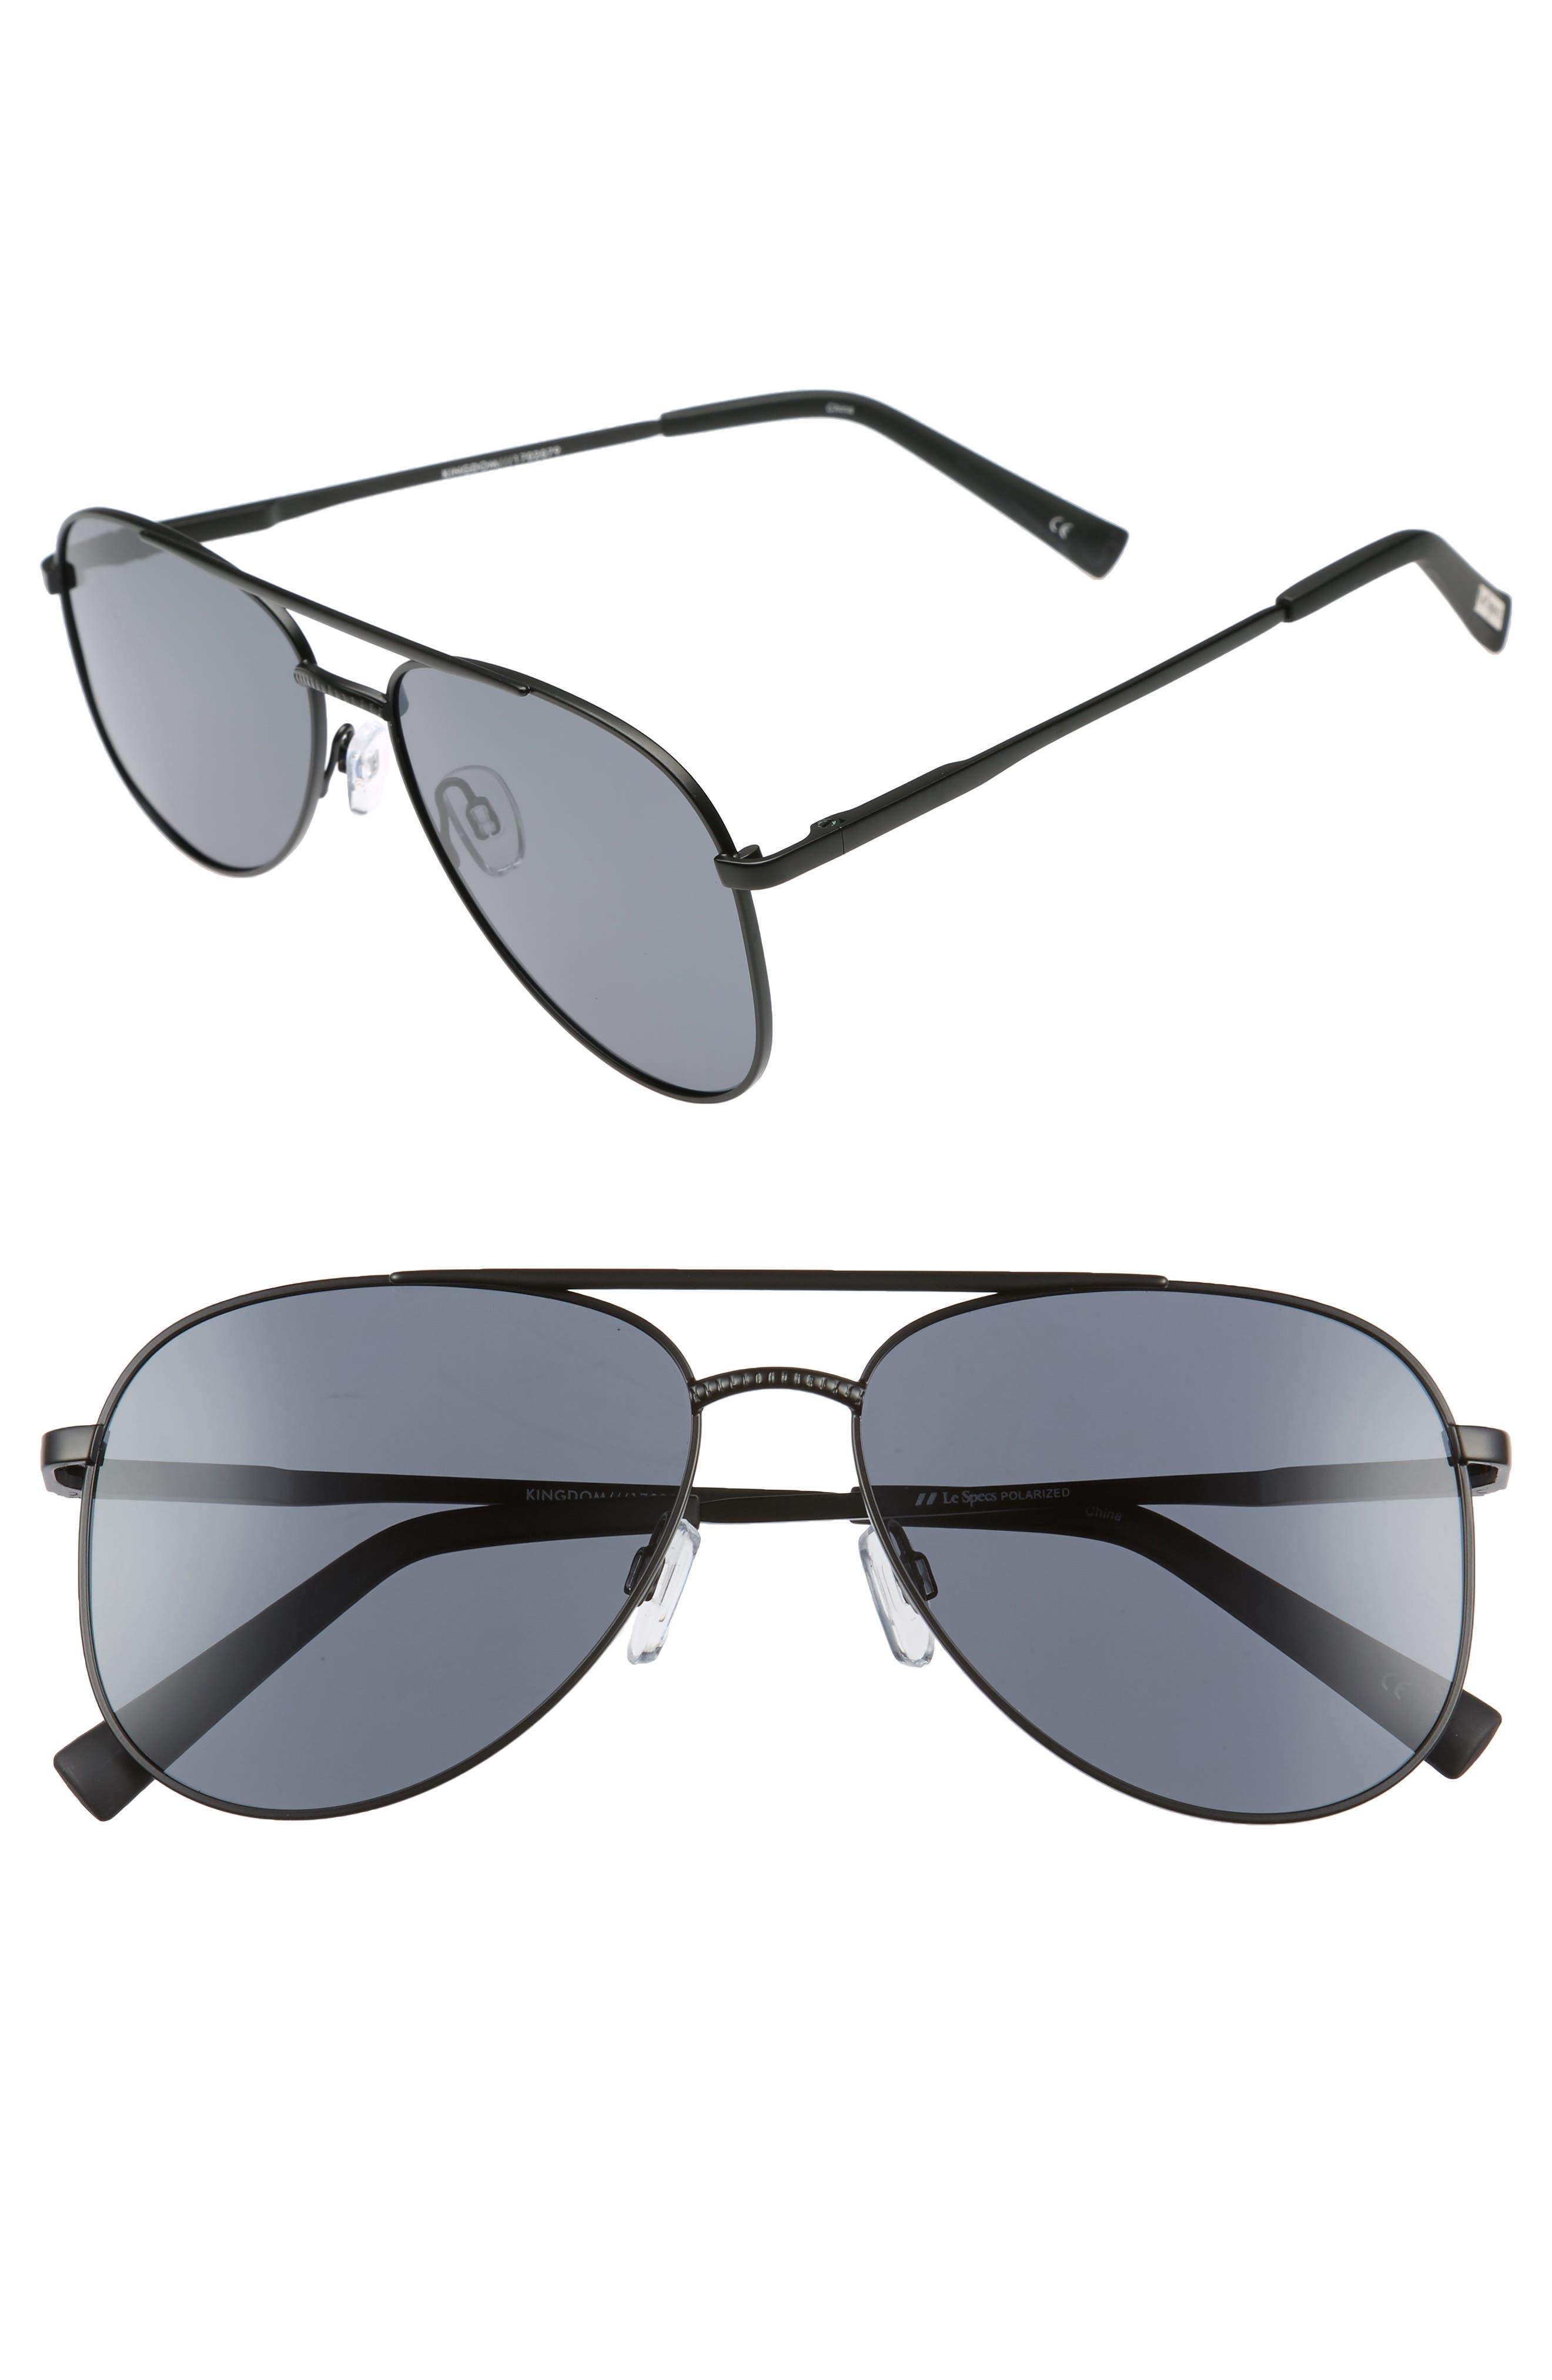 Alternate Image 1 Selected - Le Specs Kingdom 57mm Polarized Aviator Sunglasses